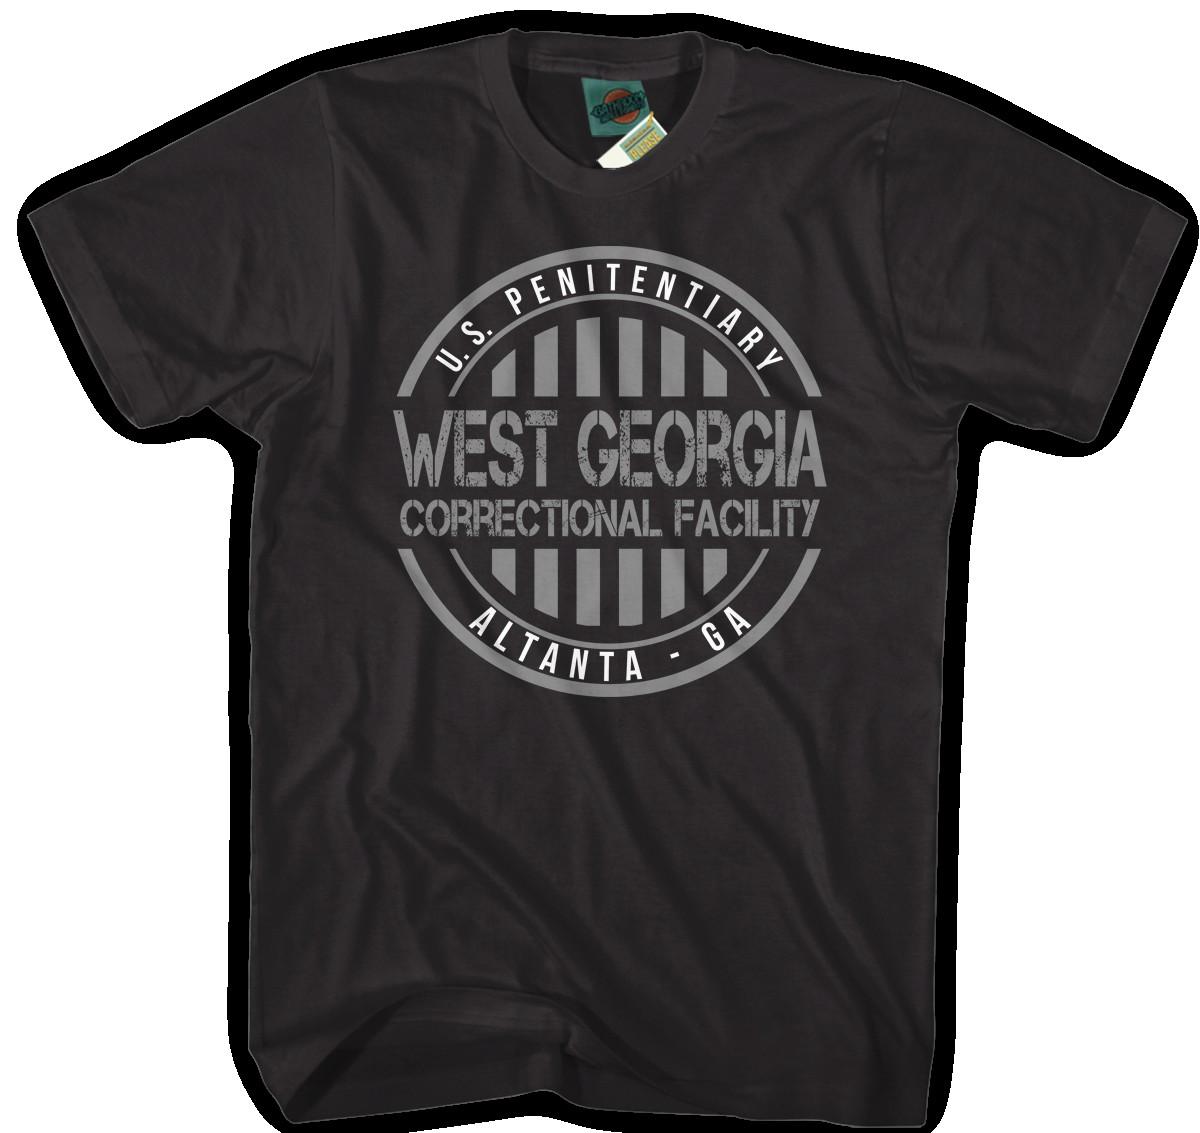 WALKING-DEAD-SEASON-3-INSPIRED-WEST-GEORGIA-PRISON-Hommes-T-Shirt